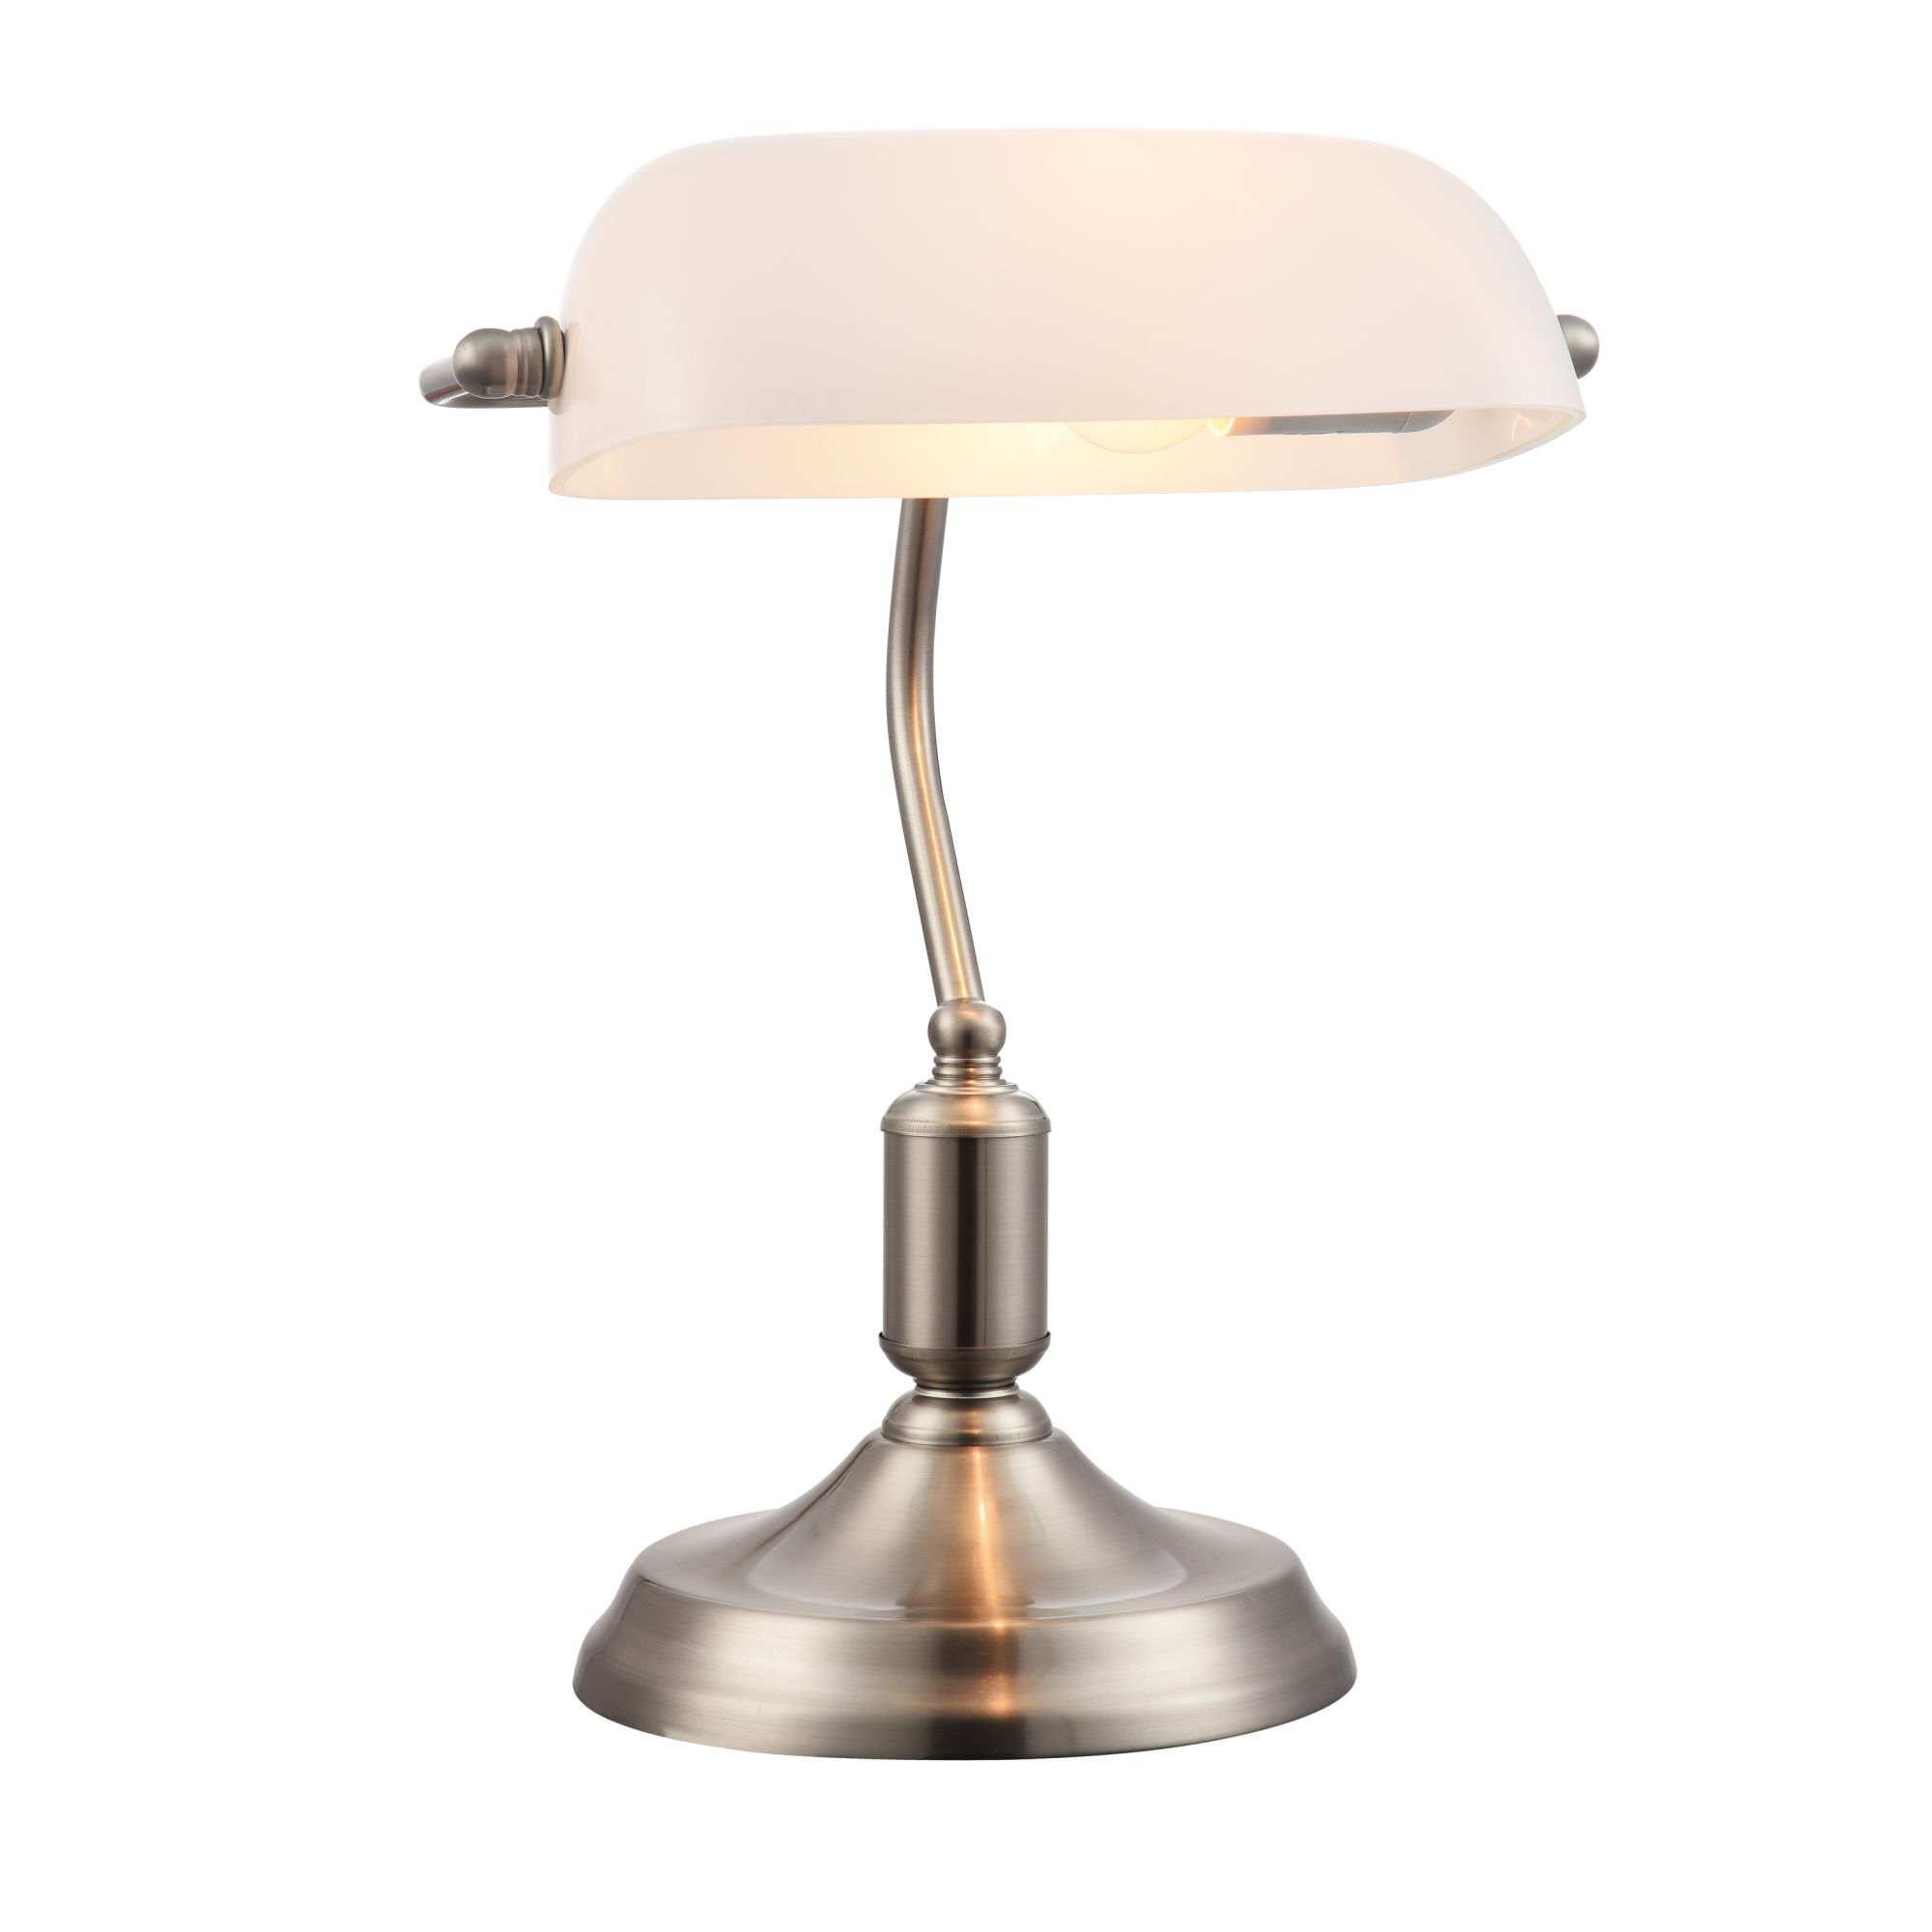 Фото Настольная лампа офисная Maytoni Kiwi Z153-TL-01-N